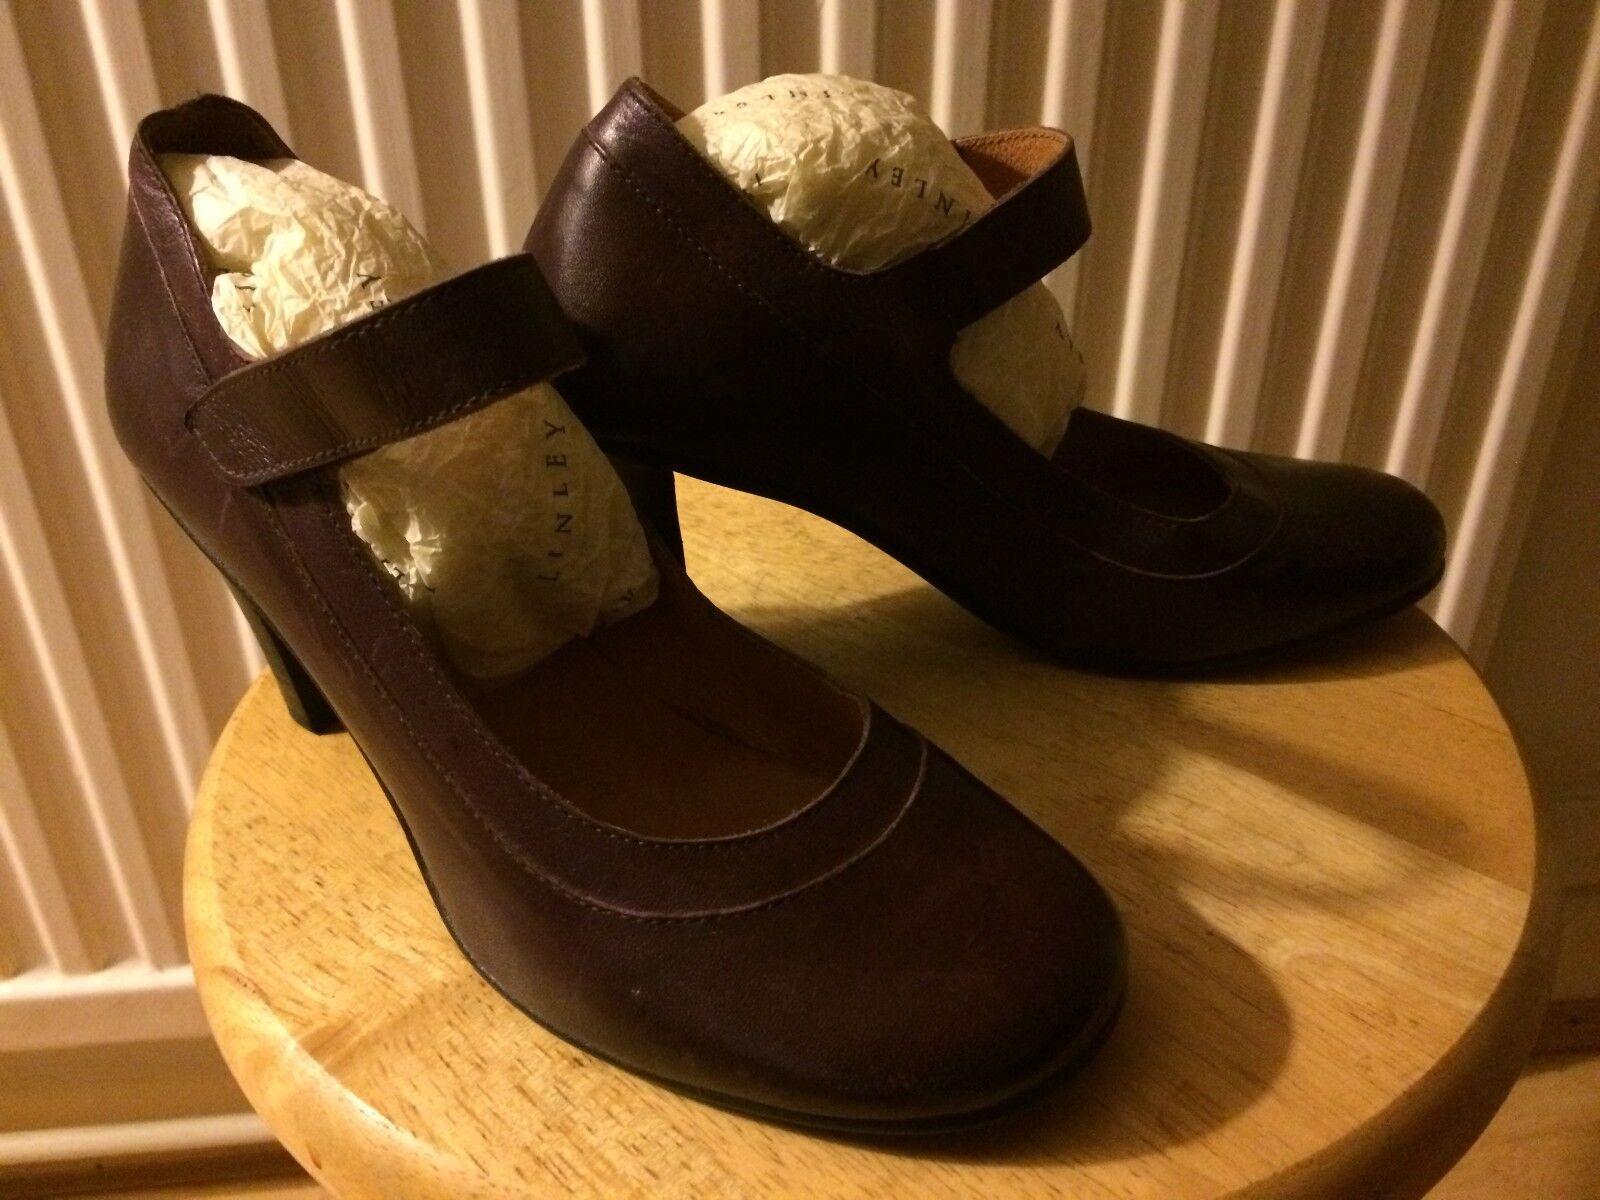 Maroon Maroon Maroon Mary janes chaussures tout cuir eu 37 Talon Haut Fermeture Velcro Fancy c82478